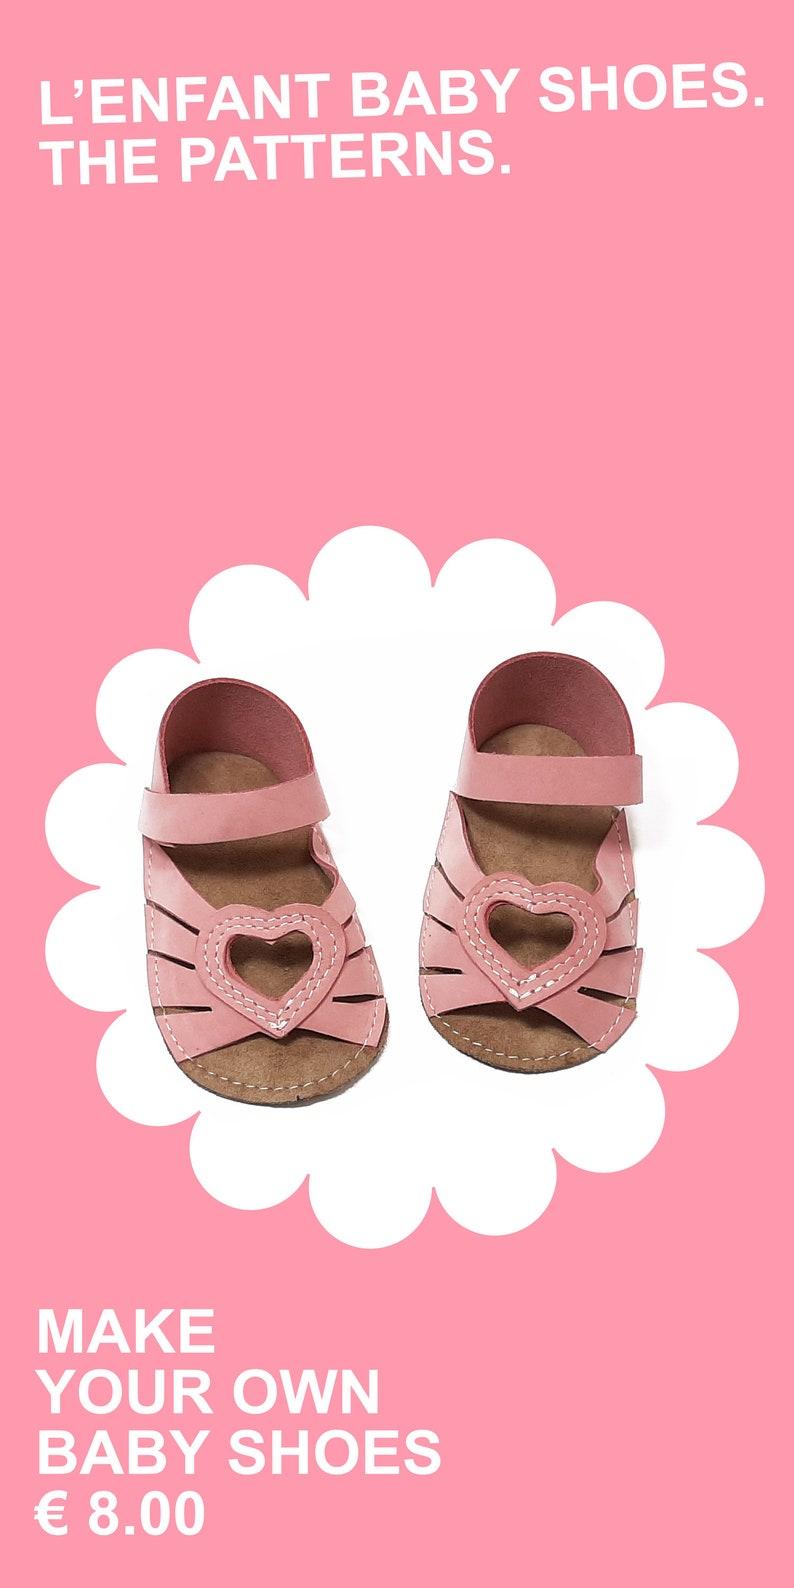 diy baby wedding shoes Cutest baby shoe patterns leather baby shoes sewing pattern baby shoe template